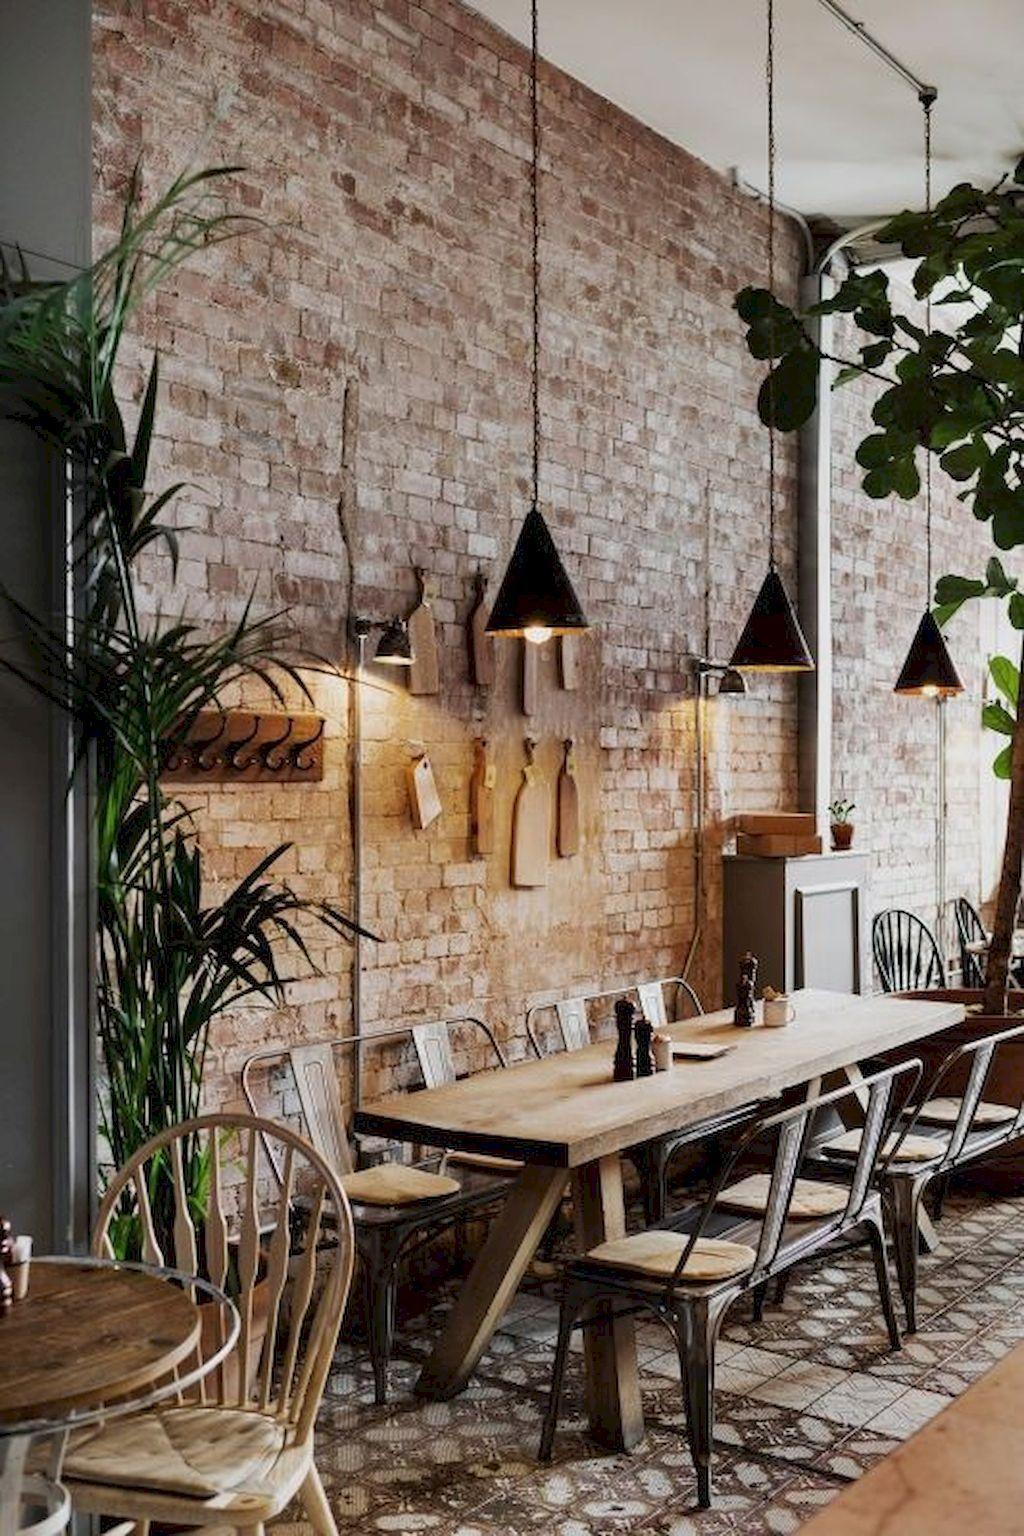 Stunning Farmhouse Interior Design Ideas To Realize Your Dreams 29